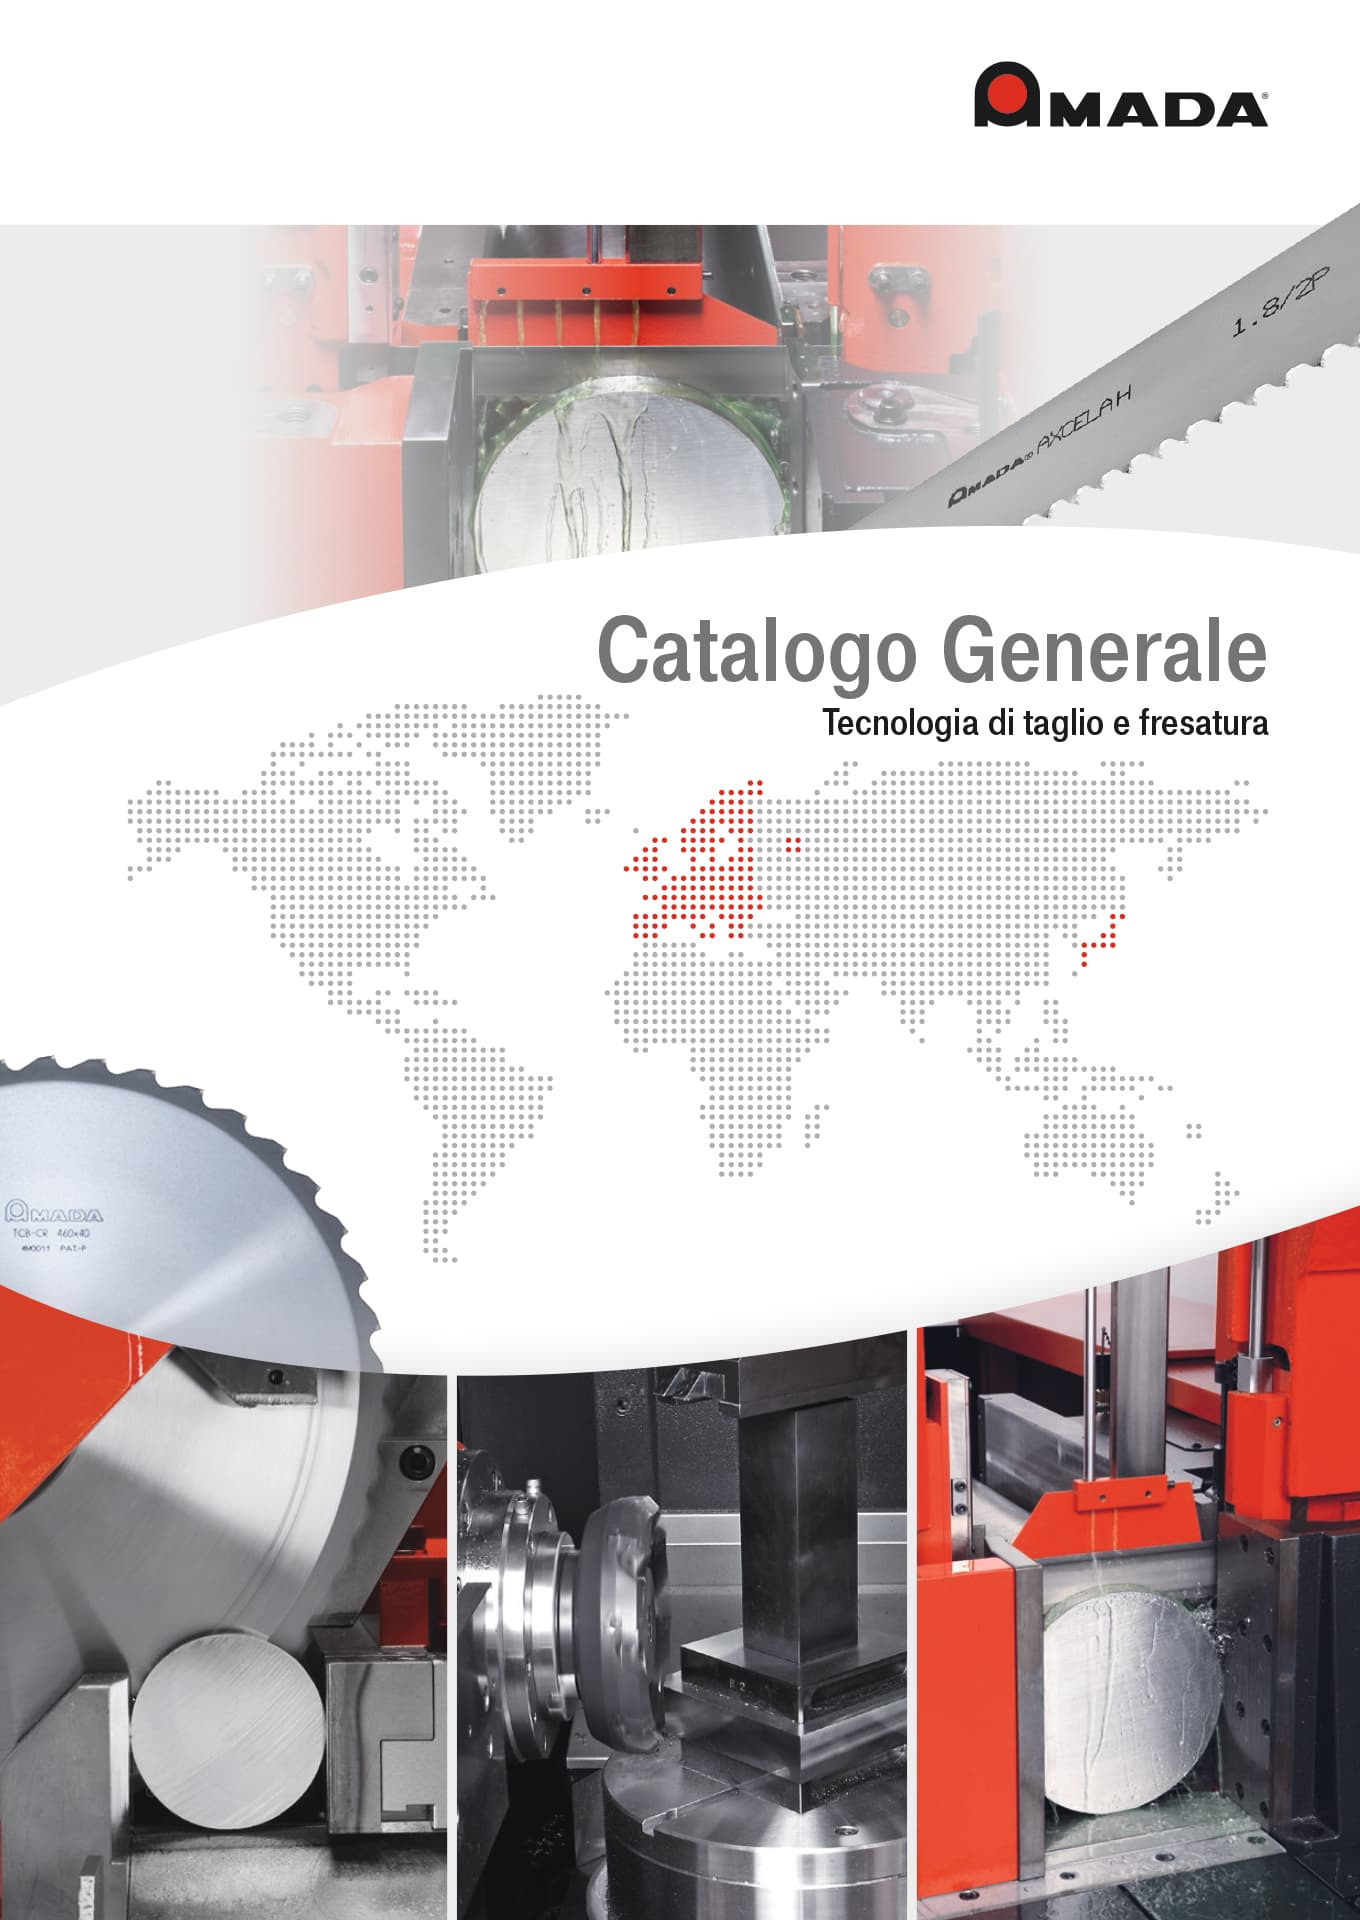 PDF-Vorschau Amada Machine Tools Europe Produktkatalog (italienisch)